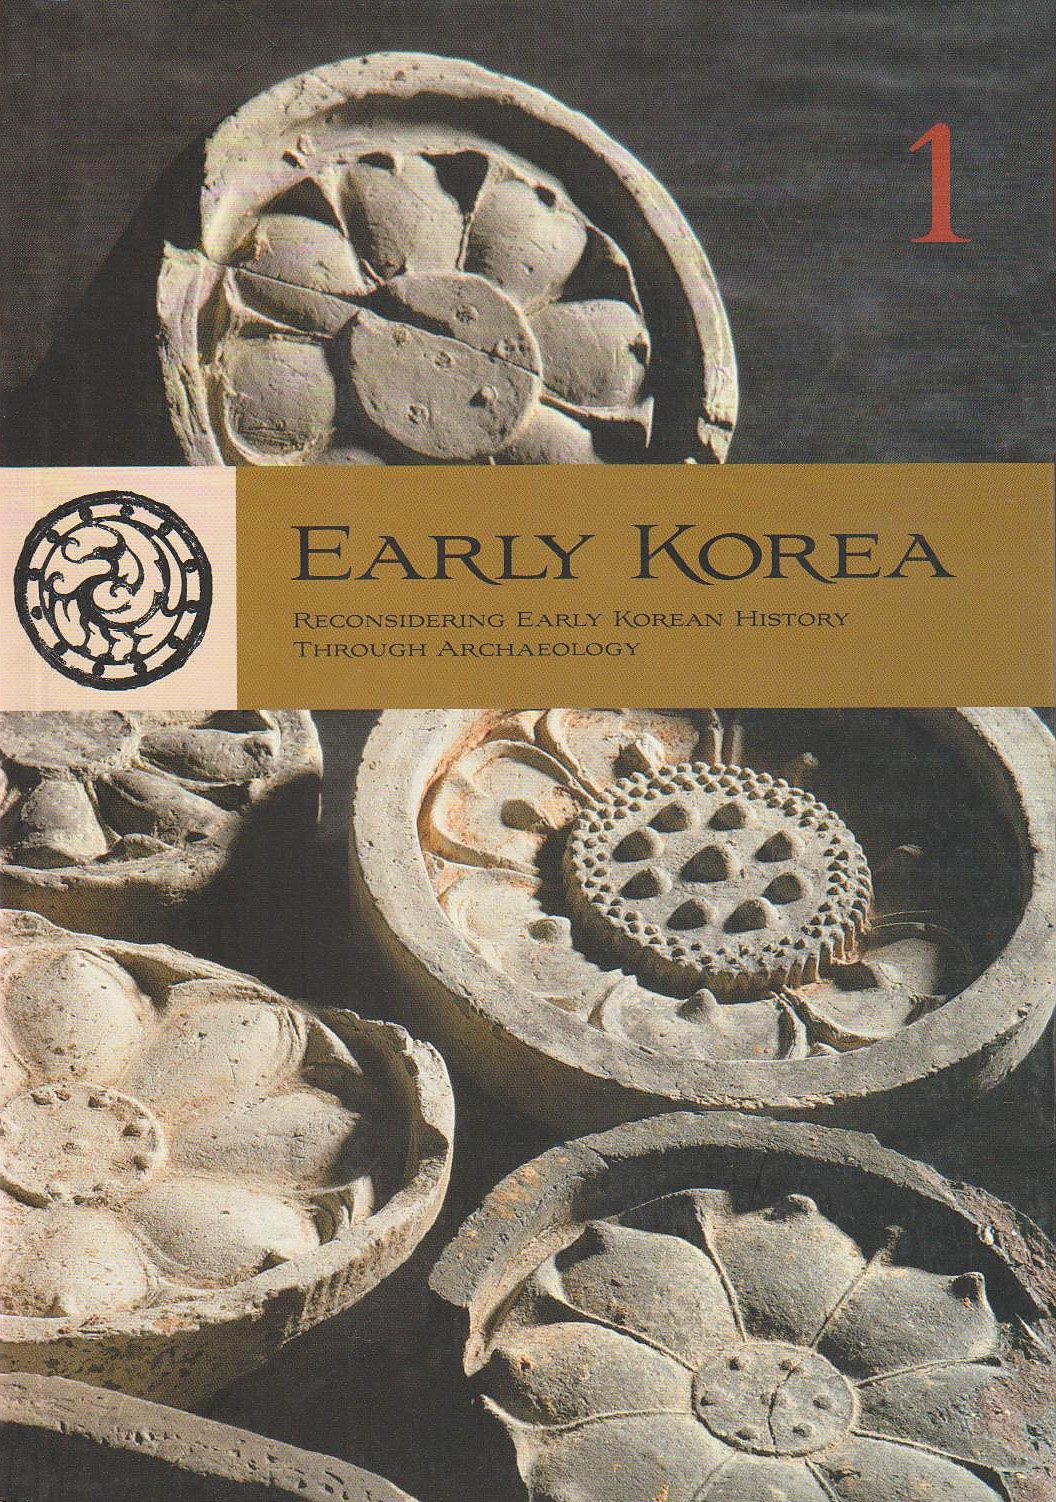 Early Korea 1: Reconsidering Early Korean History through Archaeology